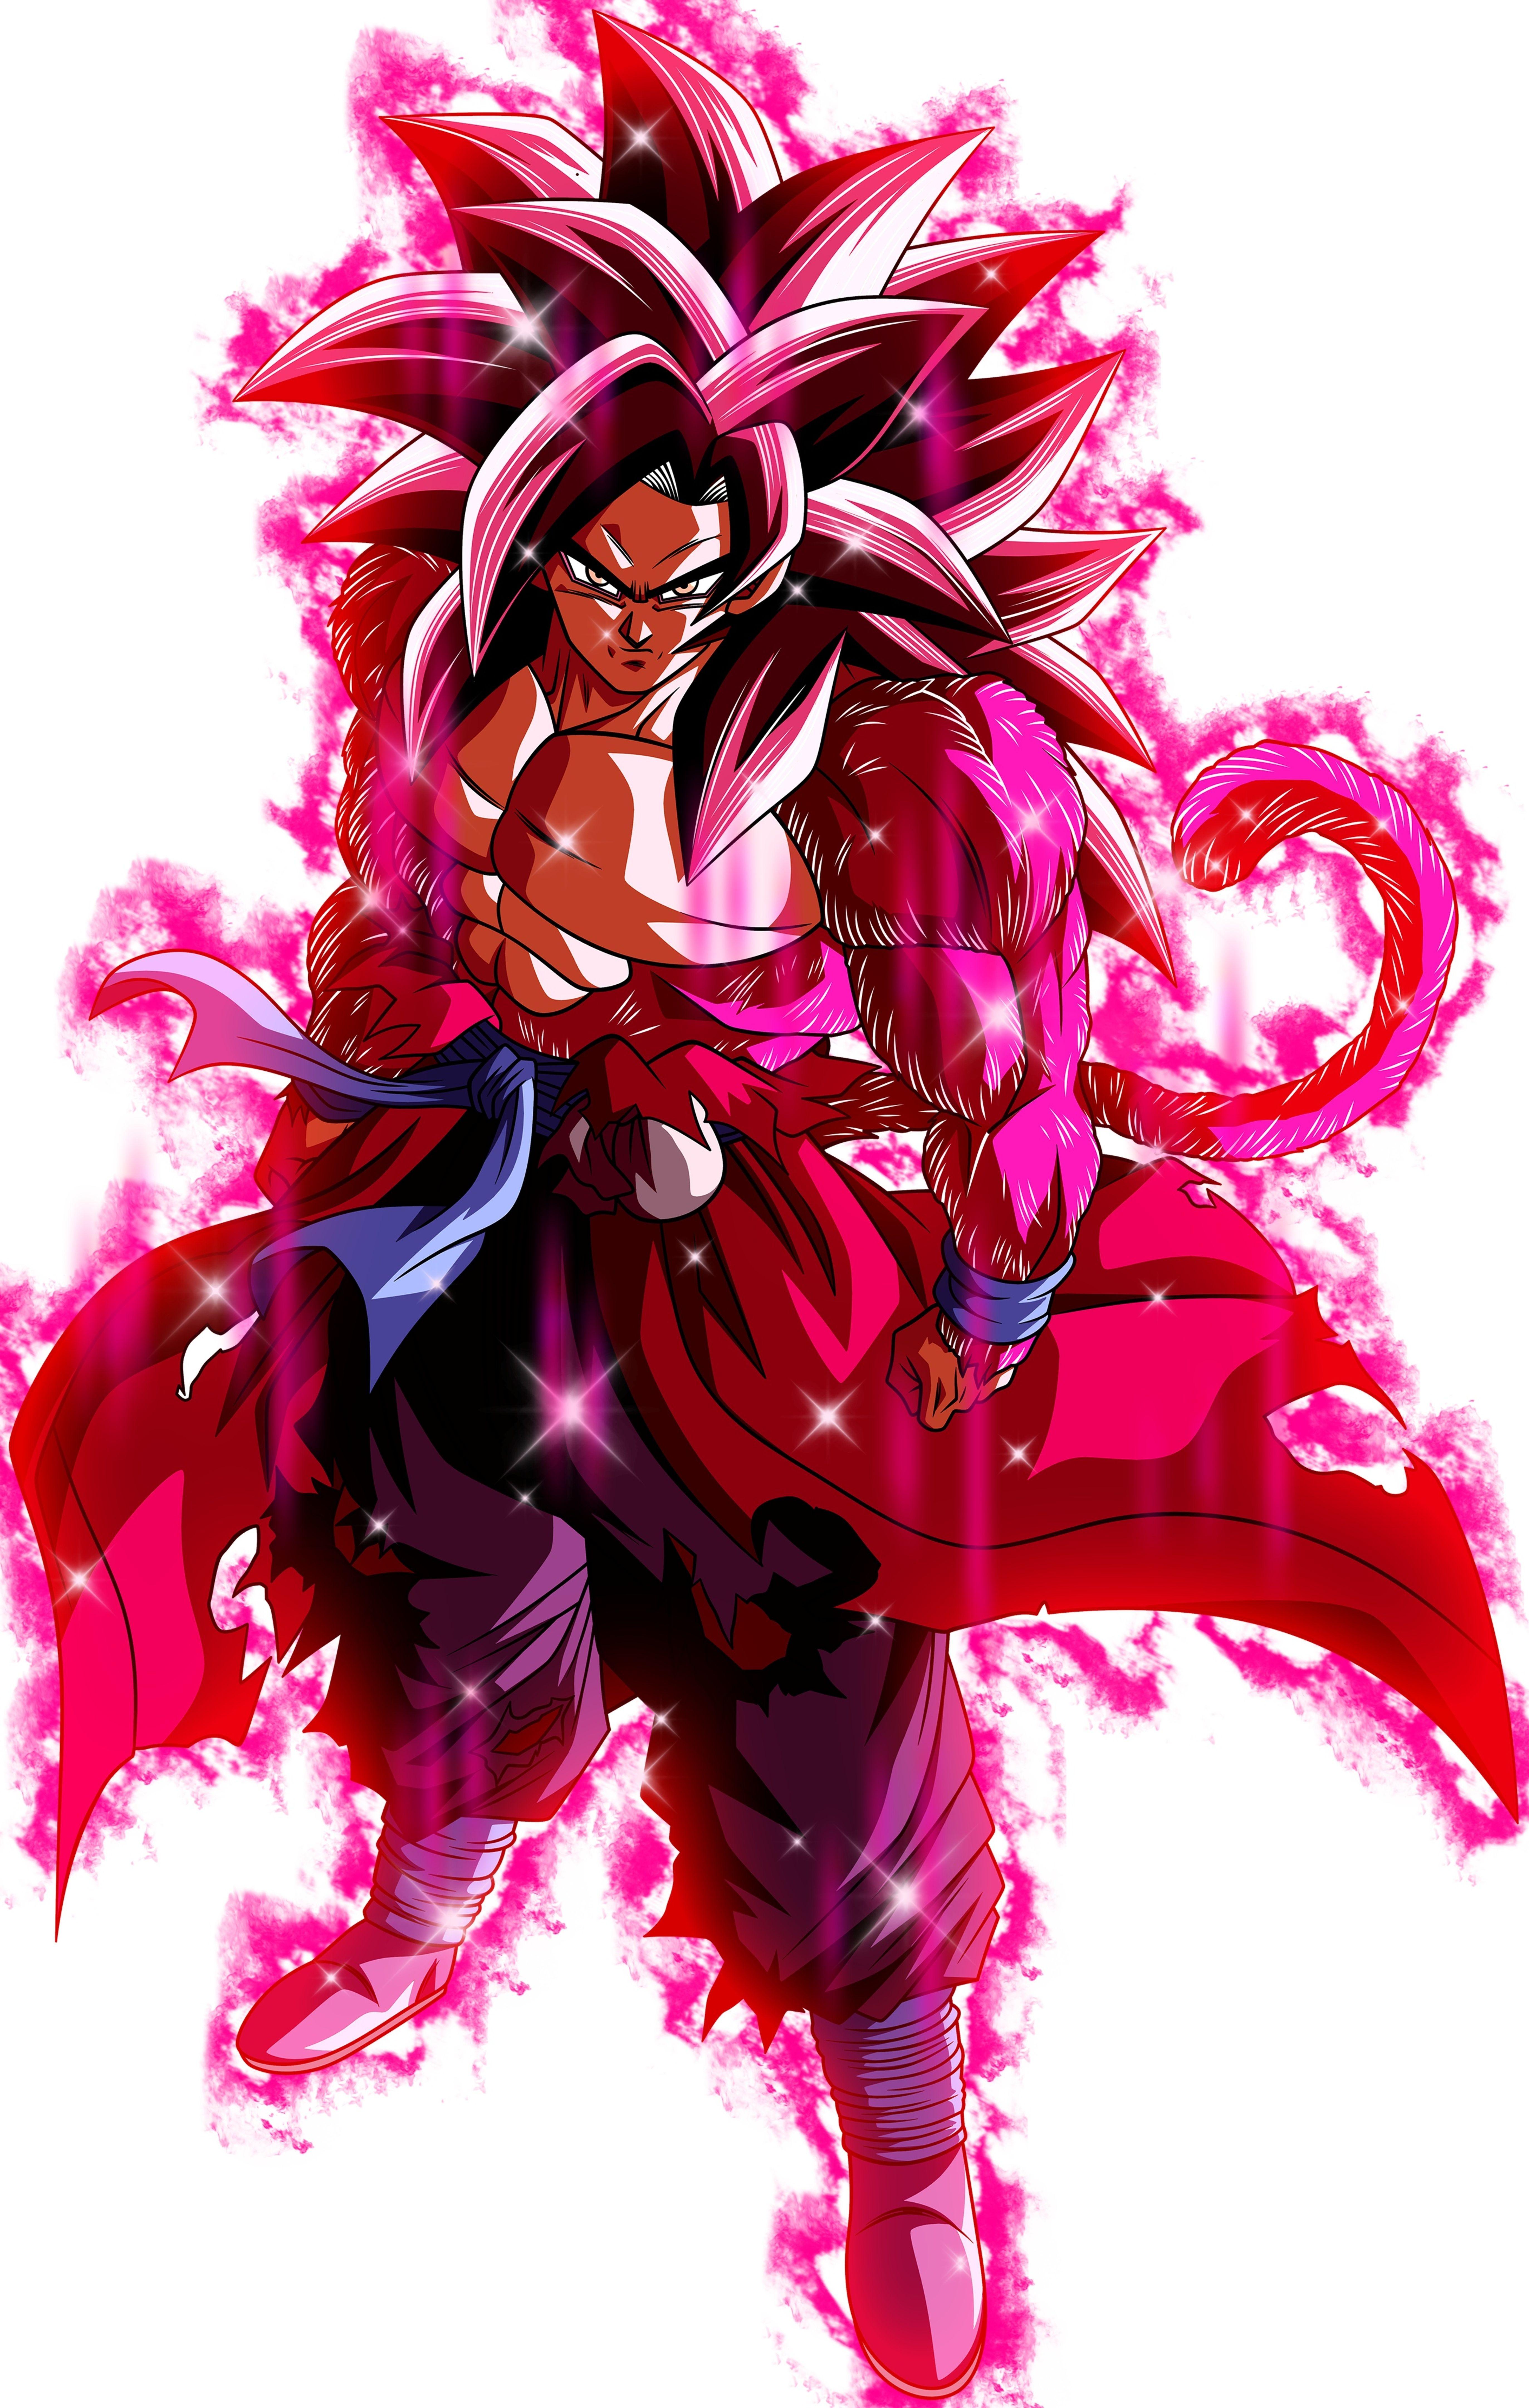 Goku Ssj4 Full Power Anime Dragon Ball Super Dragon Ball Artwork Dragon Ball Super Manga